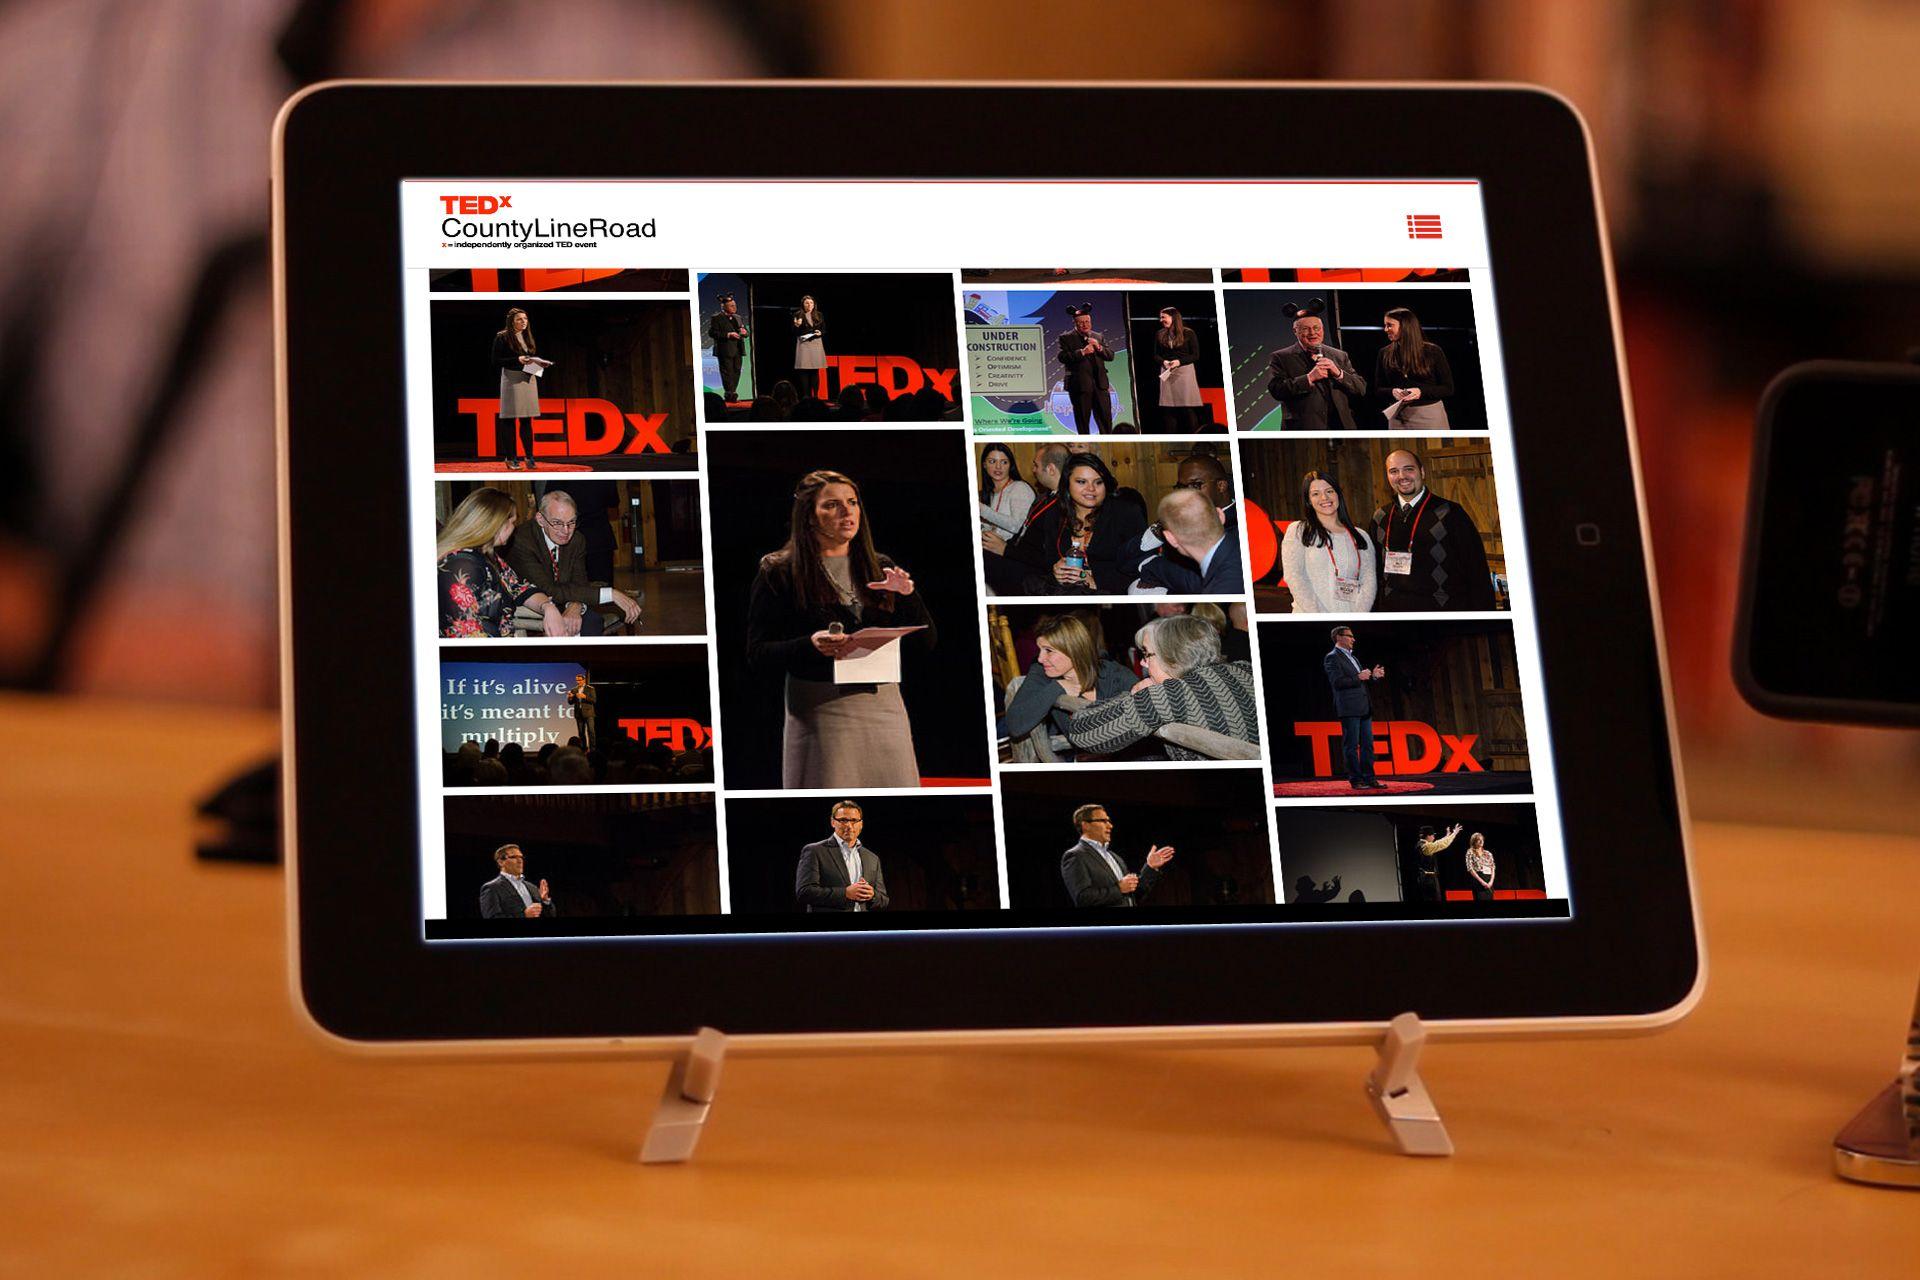 TEDxCountyLineRoad website